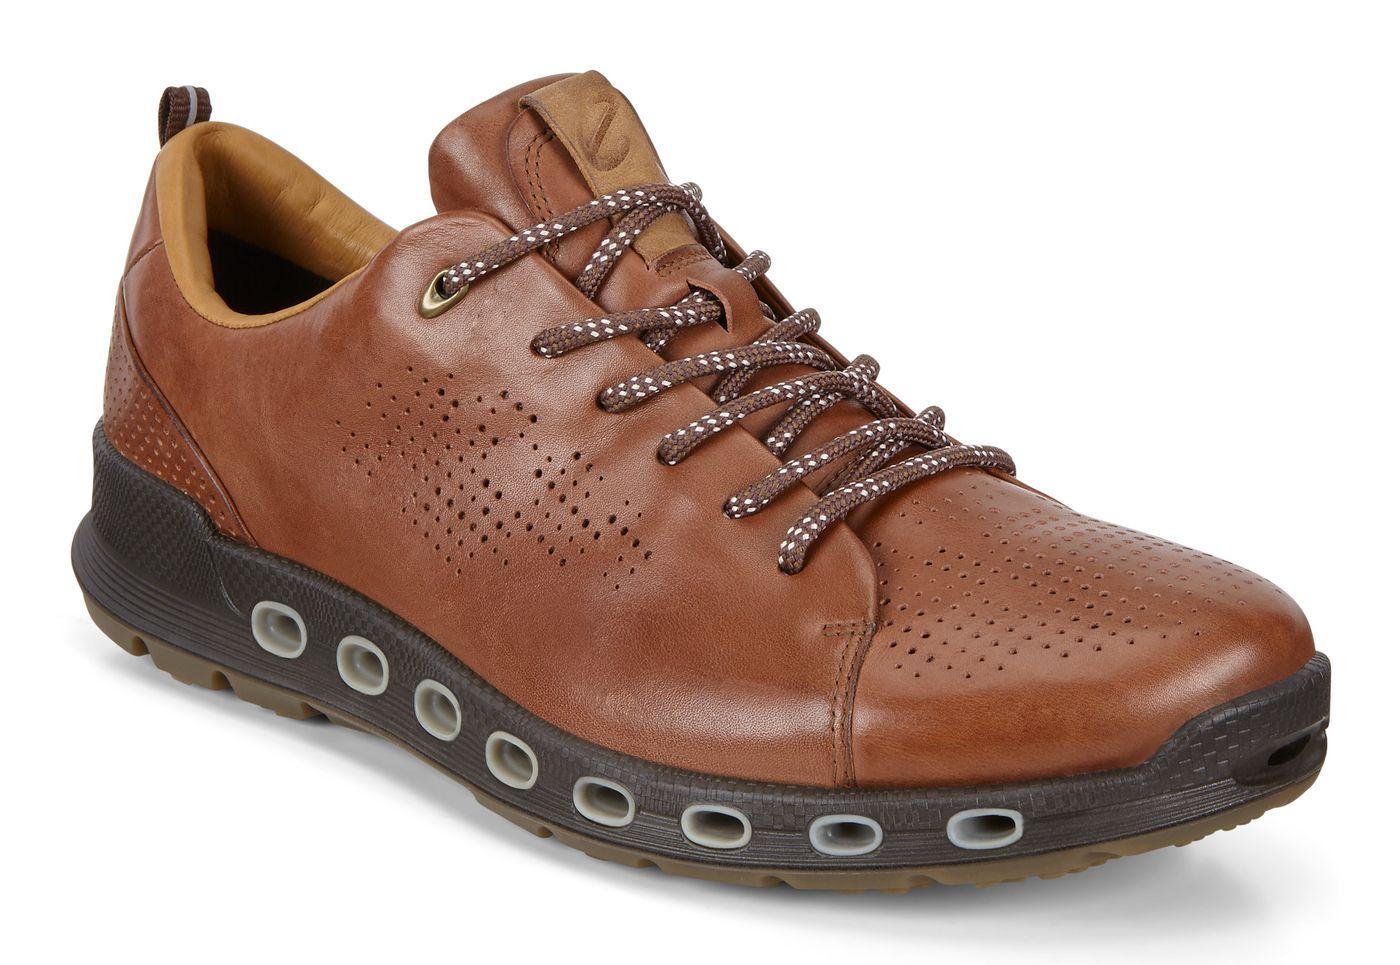 Ecco Cool 2 0 Men S Sneaker Ecco Shoes Retro Sneakers Mens Casual Shoes